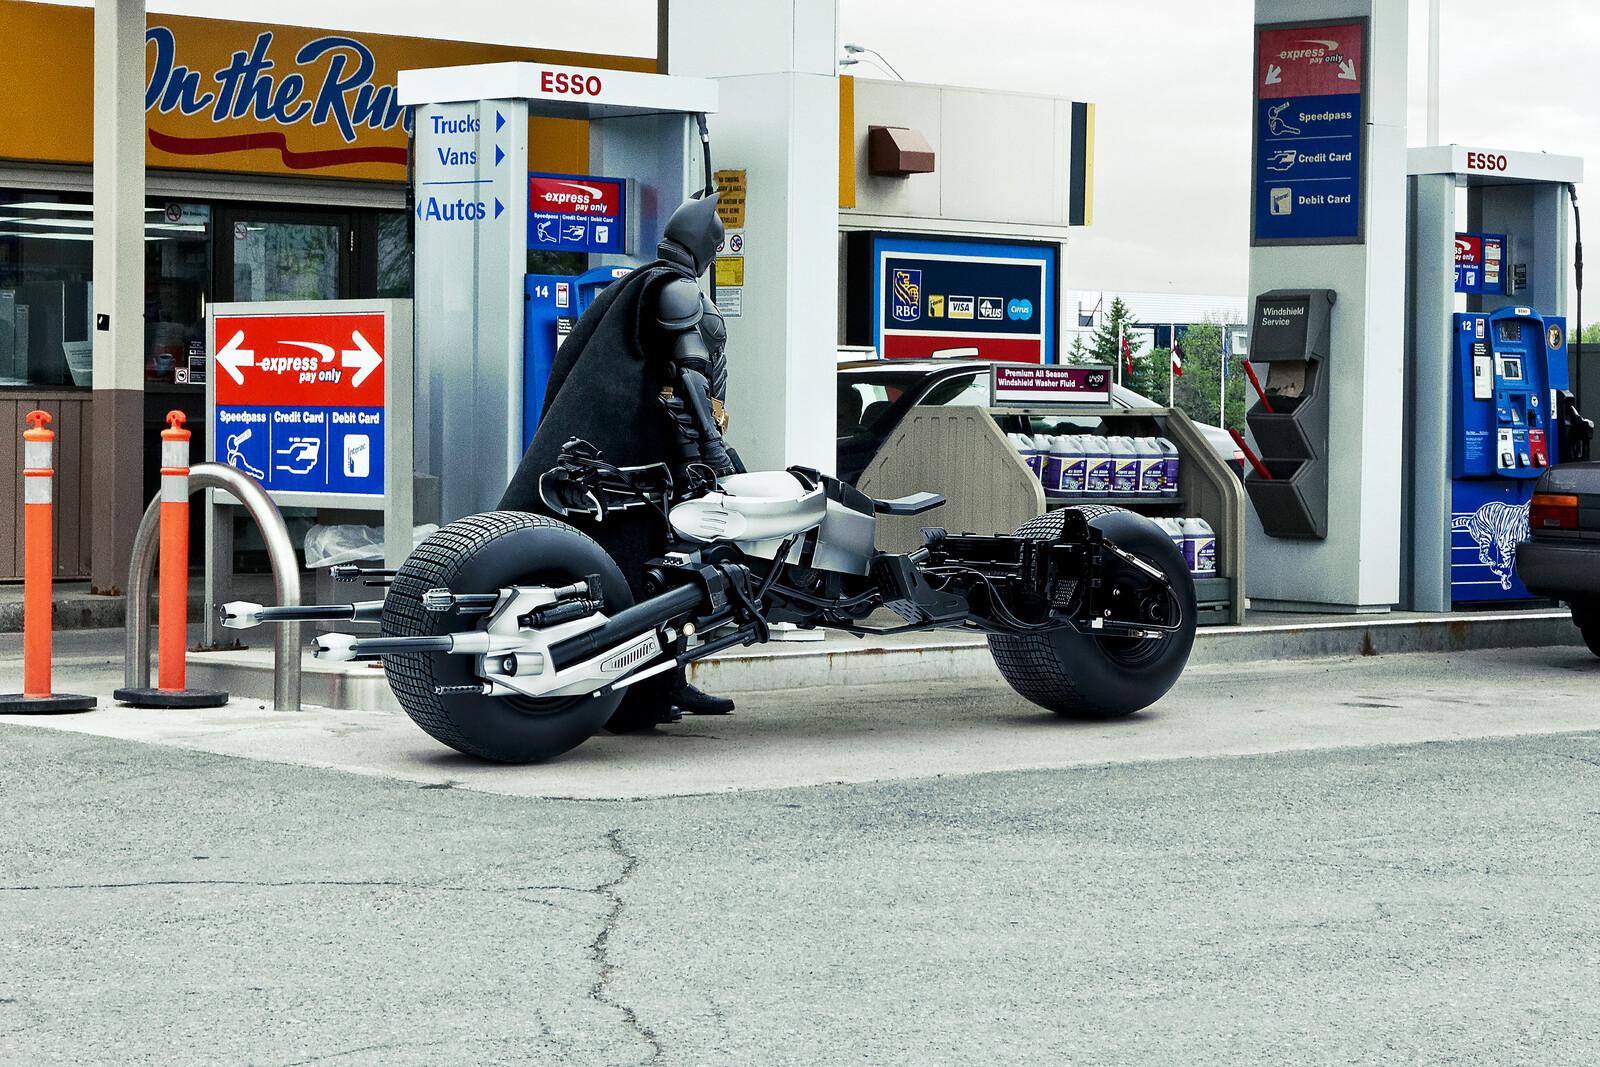 Bat-Pod at the Gas Station - Daniel Picard